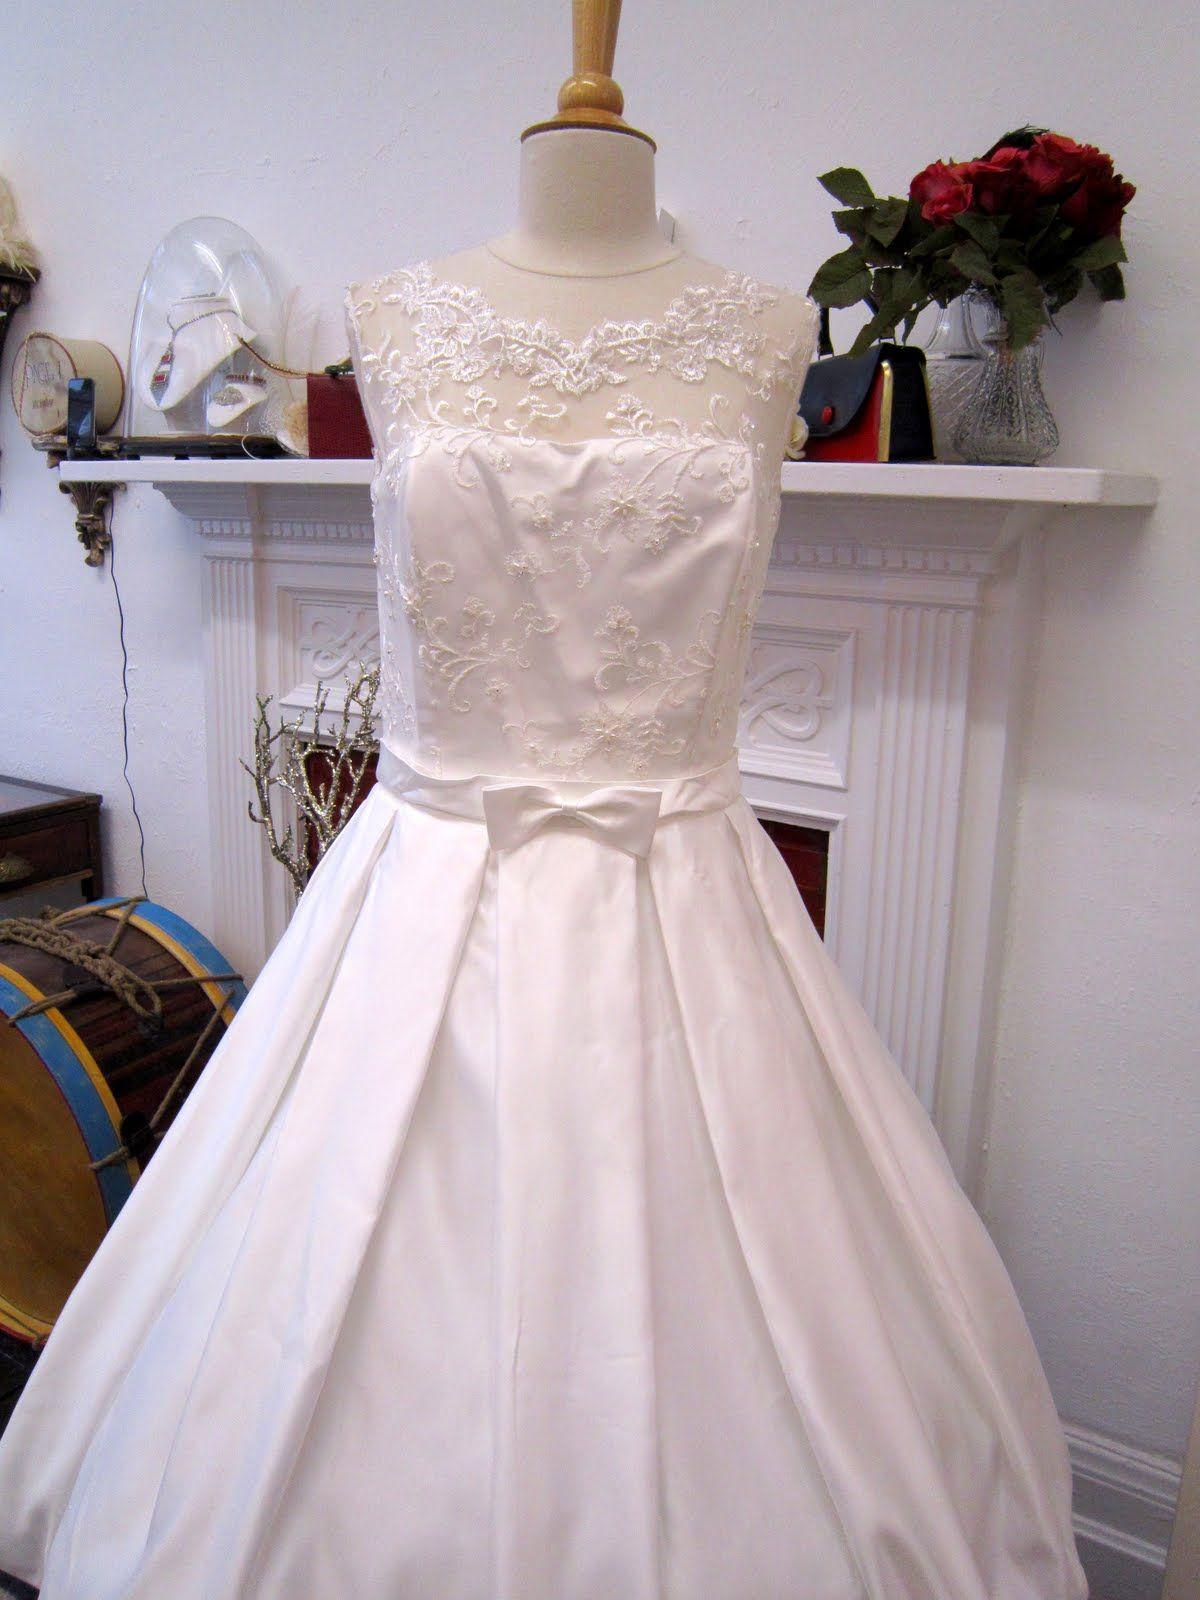 S style wedding dresses zilphaus blog s wedding dresses